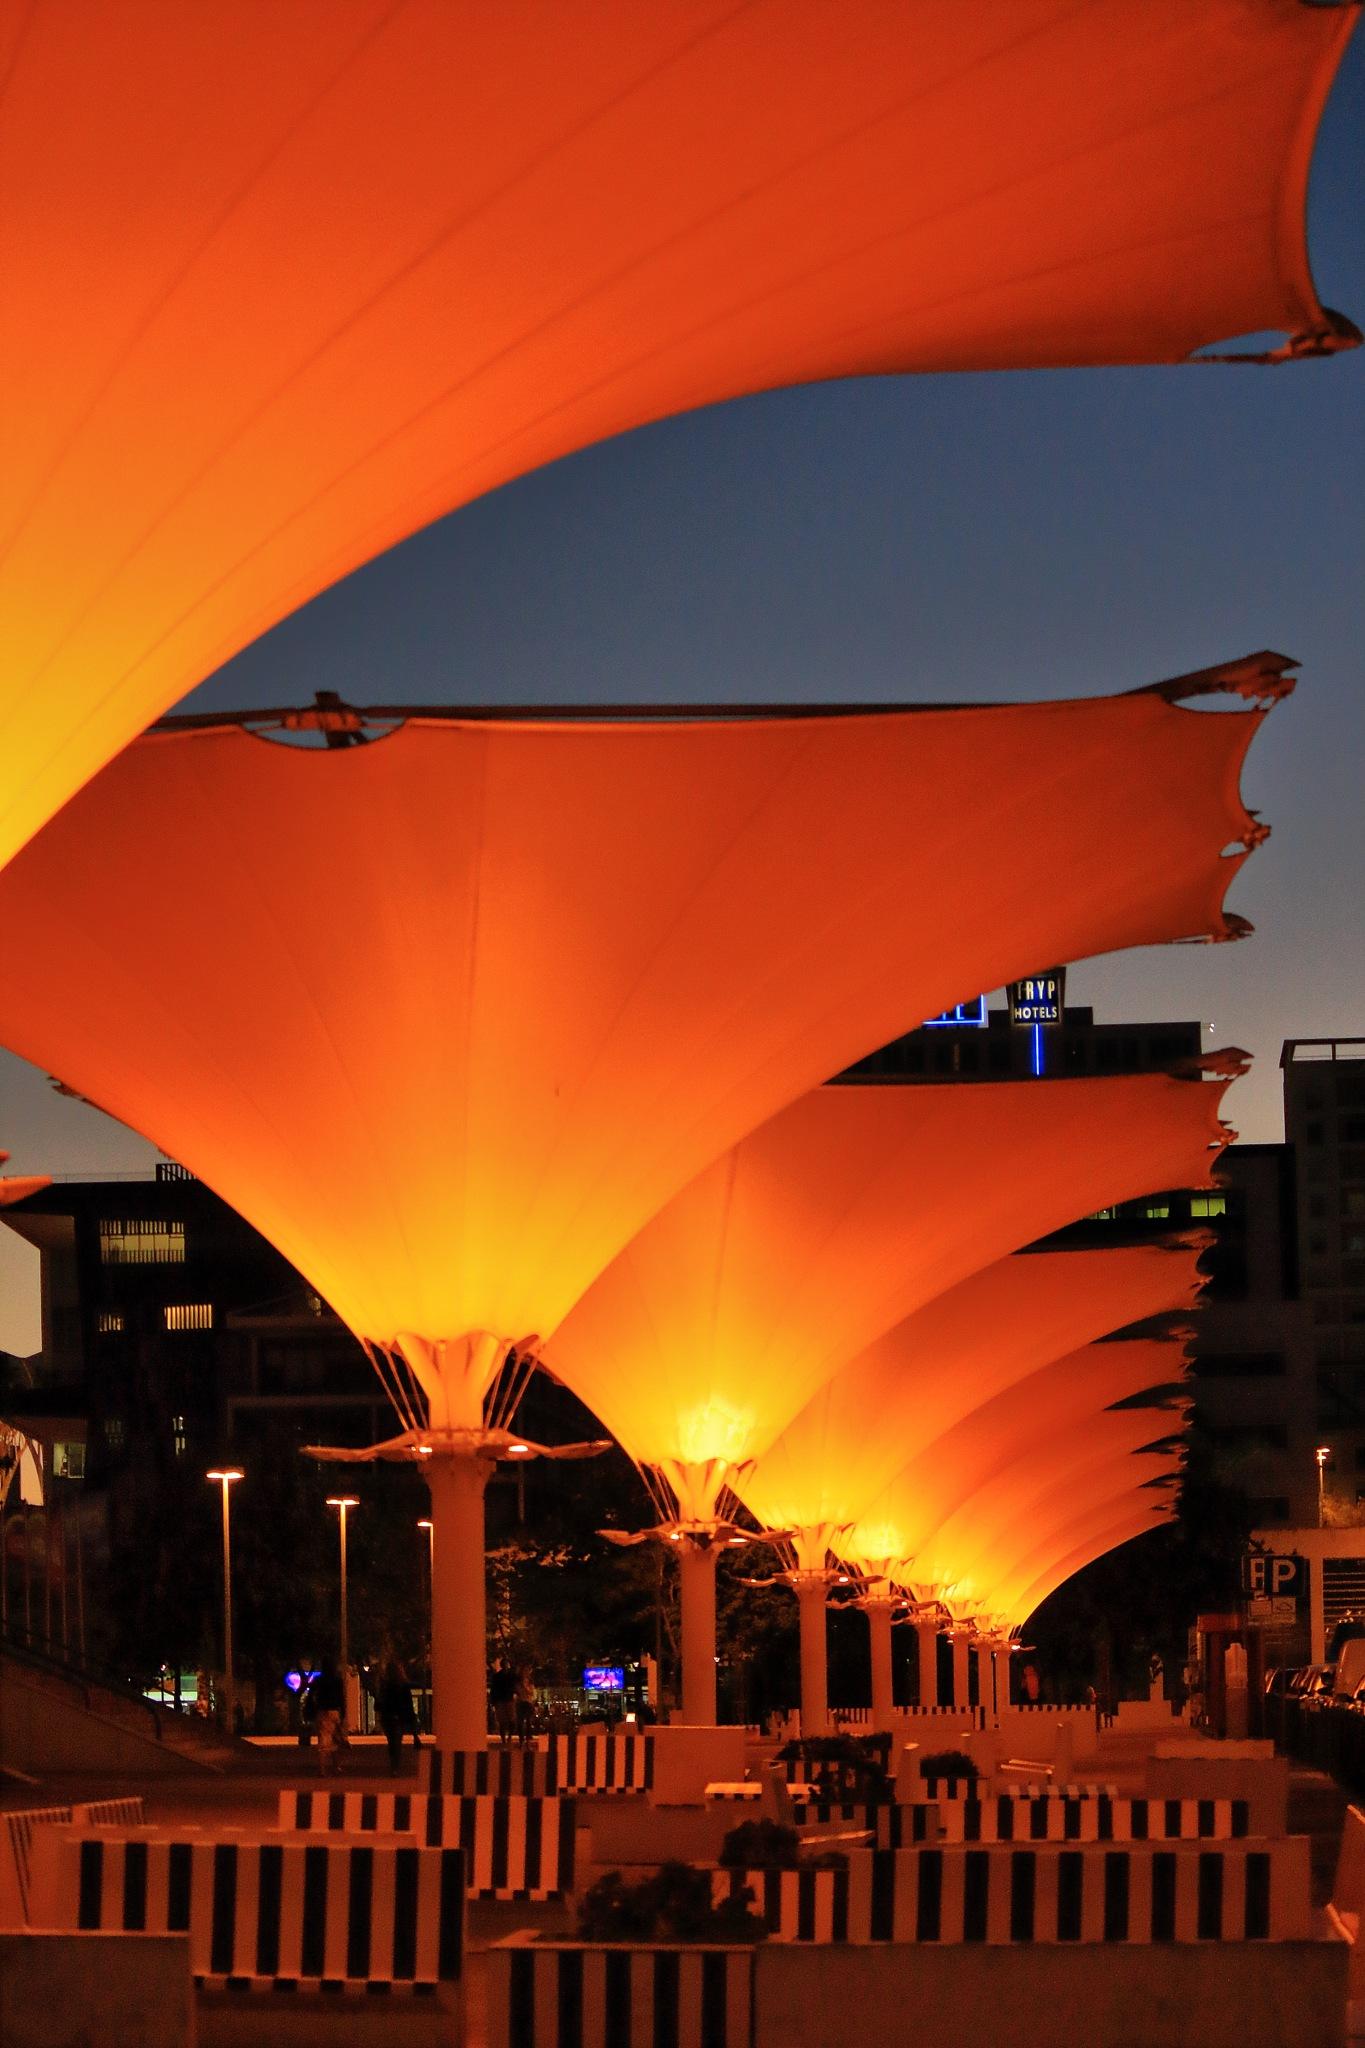 Lisbon by Sptaphotography